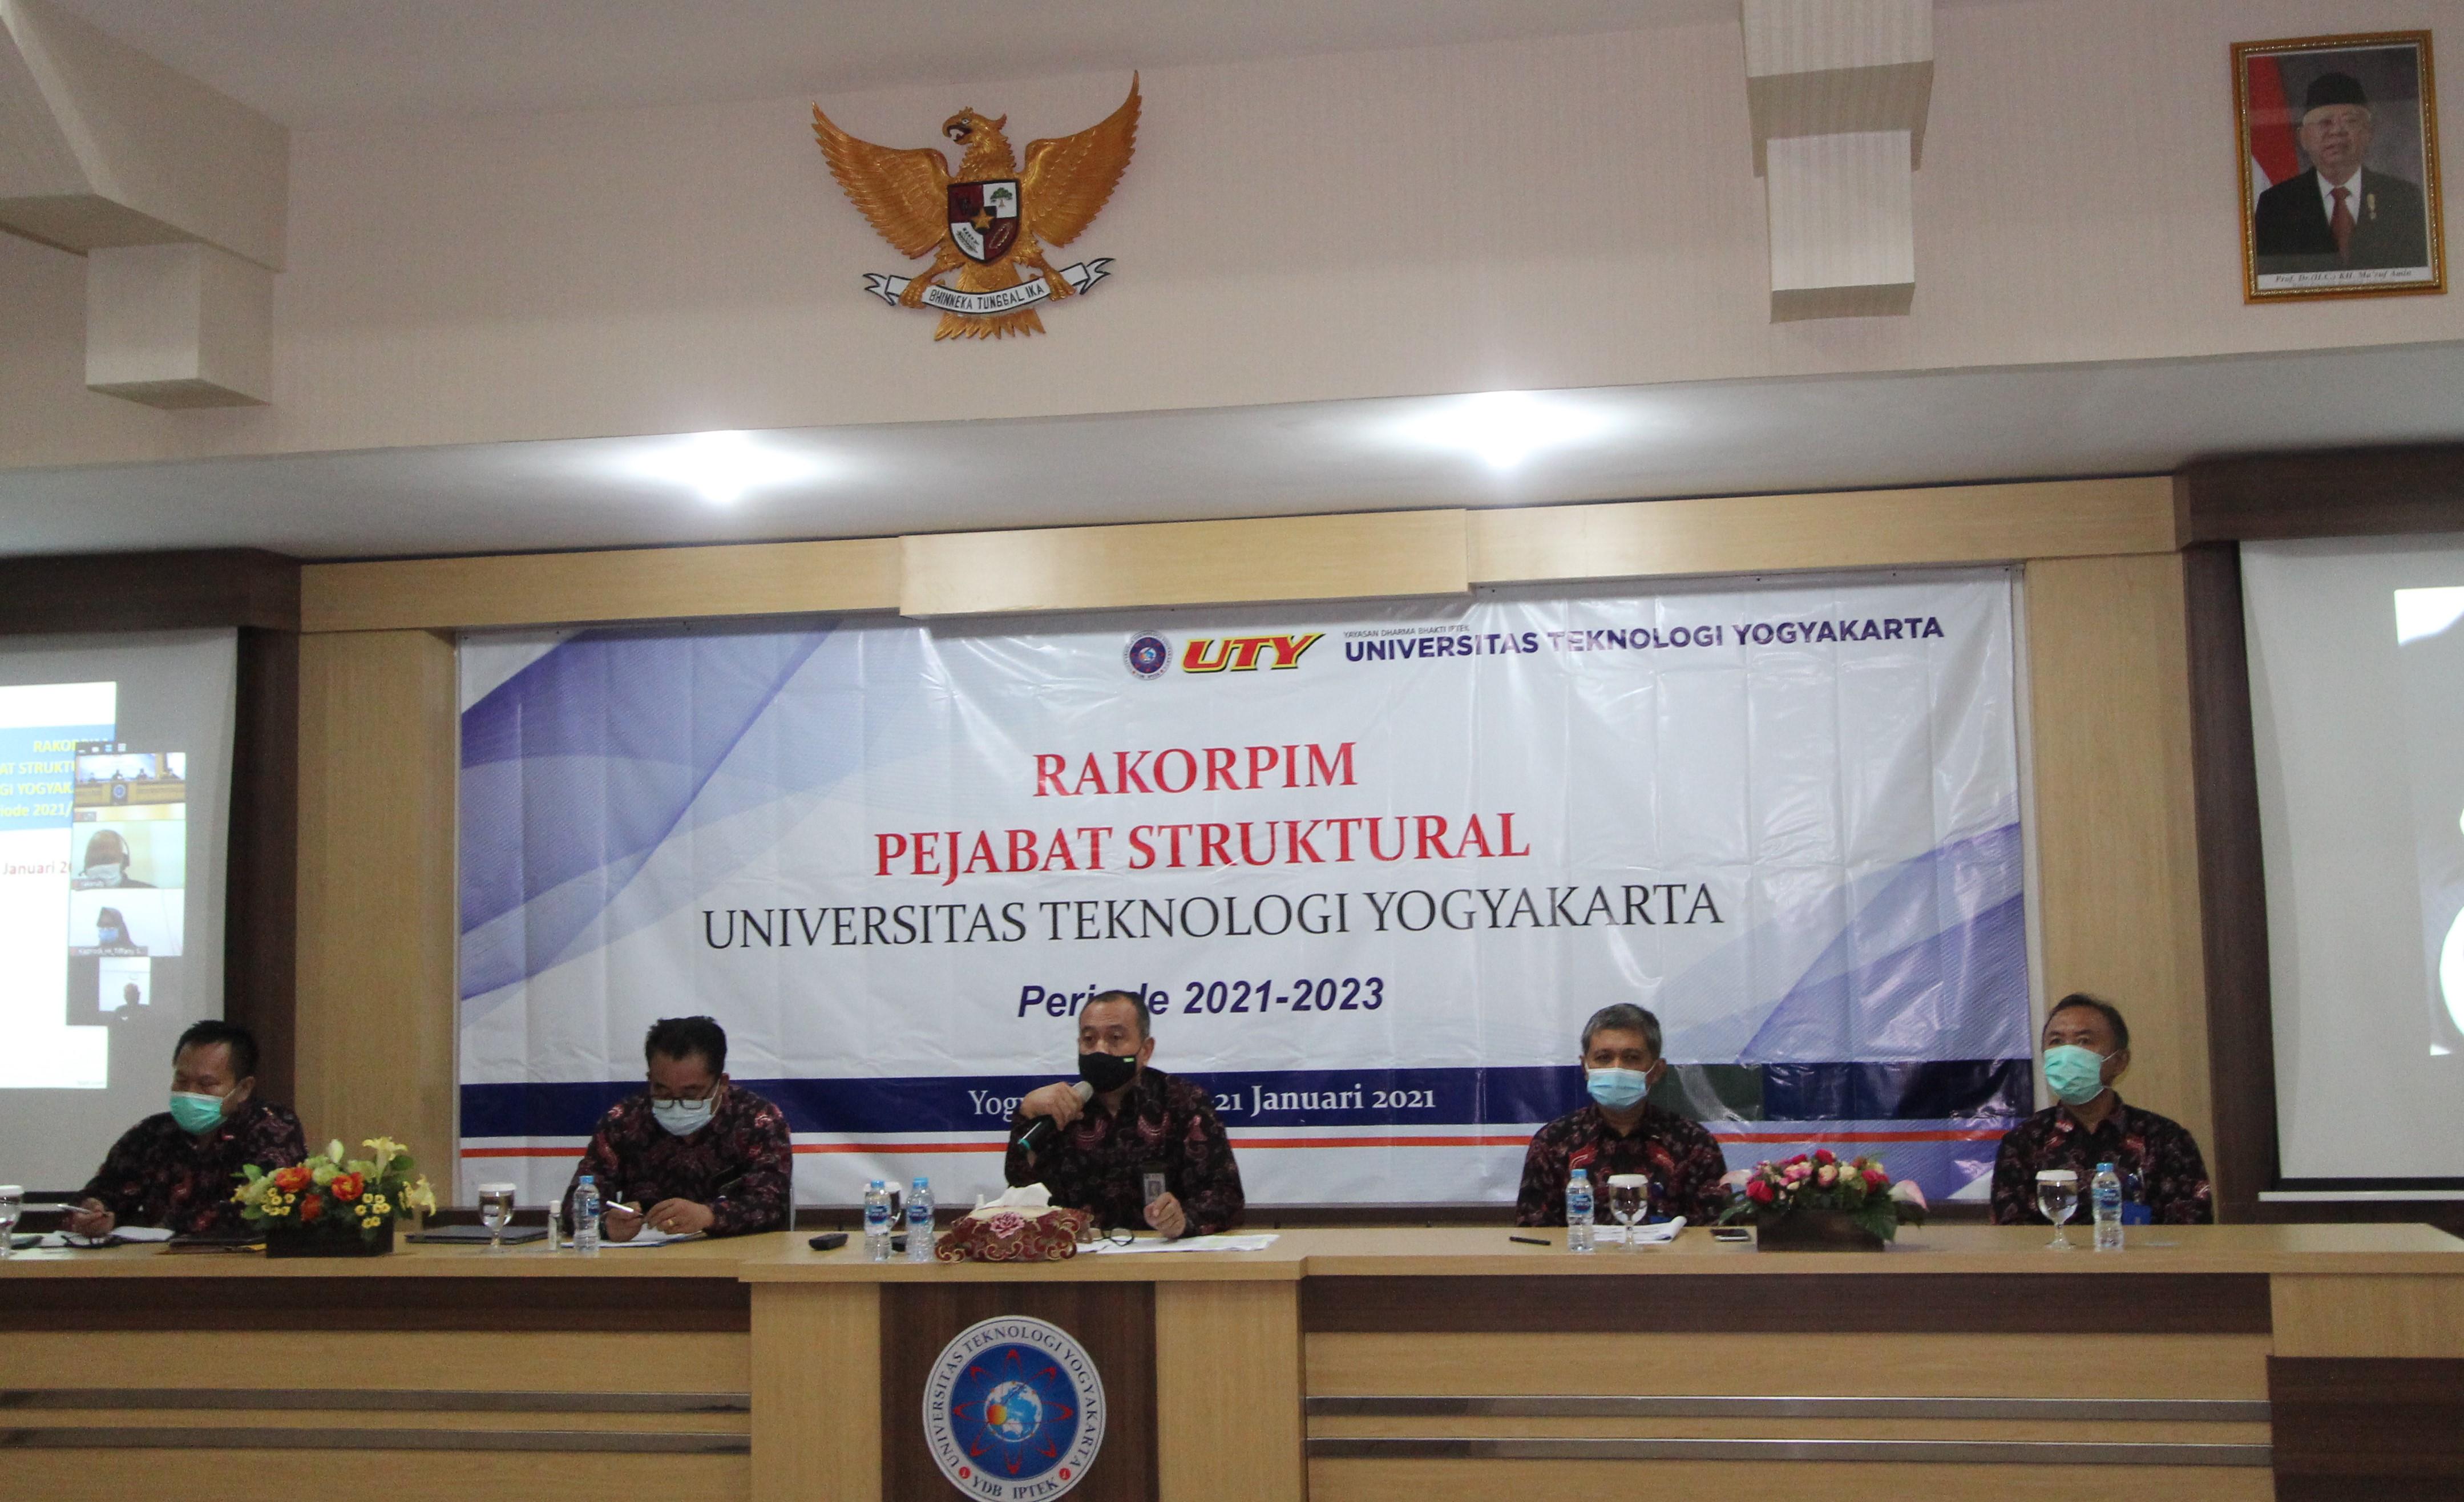 Dalam Rangka Penyamaan Persepsi dan Tindakan untuk Memajukan UTY, Rektorat Selenggarakan Rapat Koordinasi Pimpinan